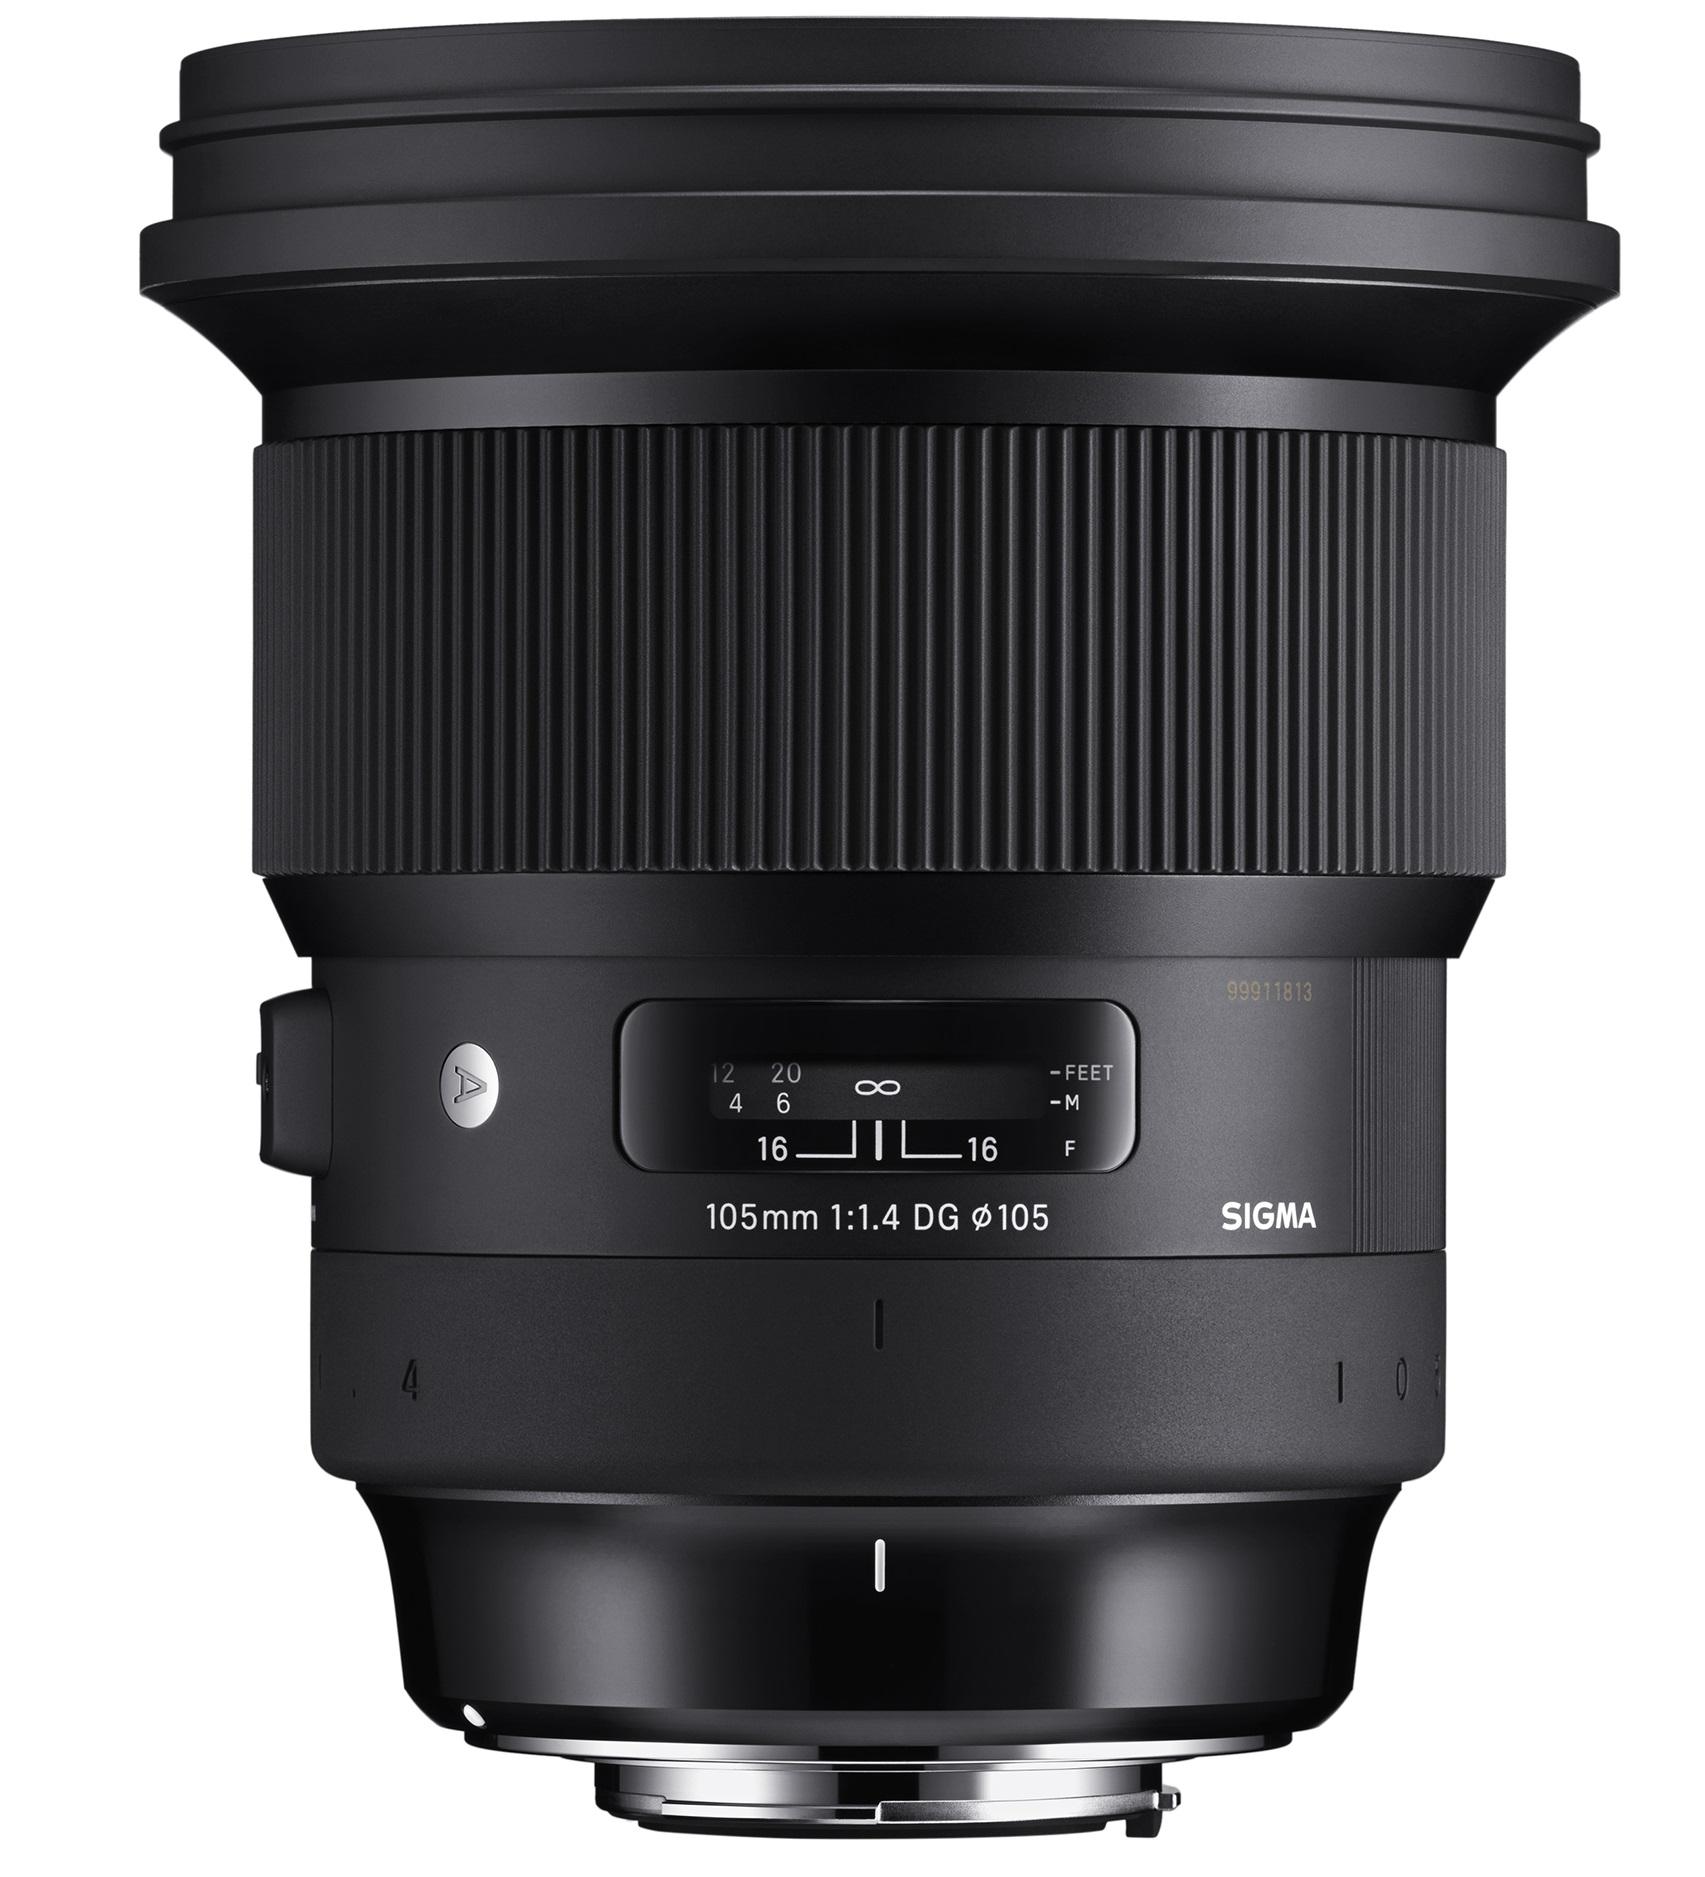 SIGMA 105 mm f/1,4 DG HSM Art pro Sony E